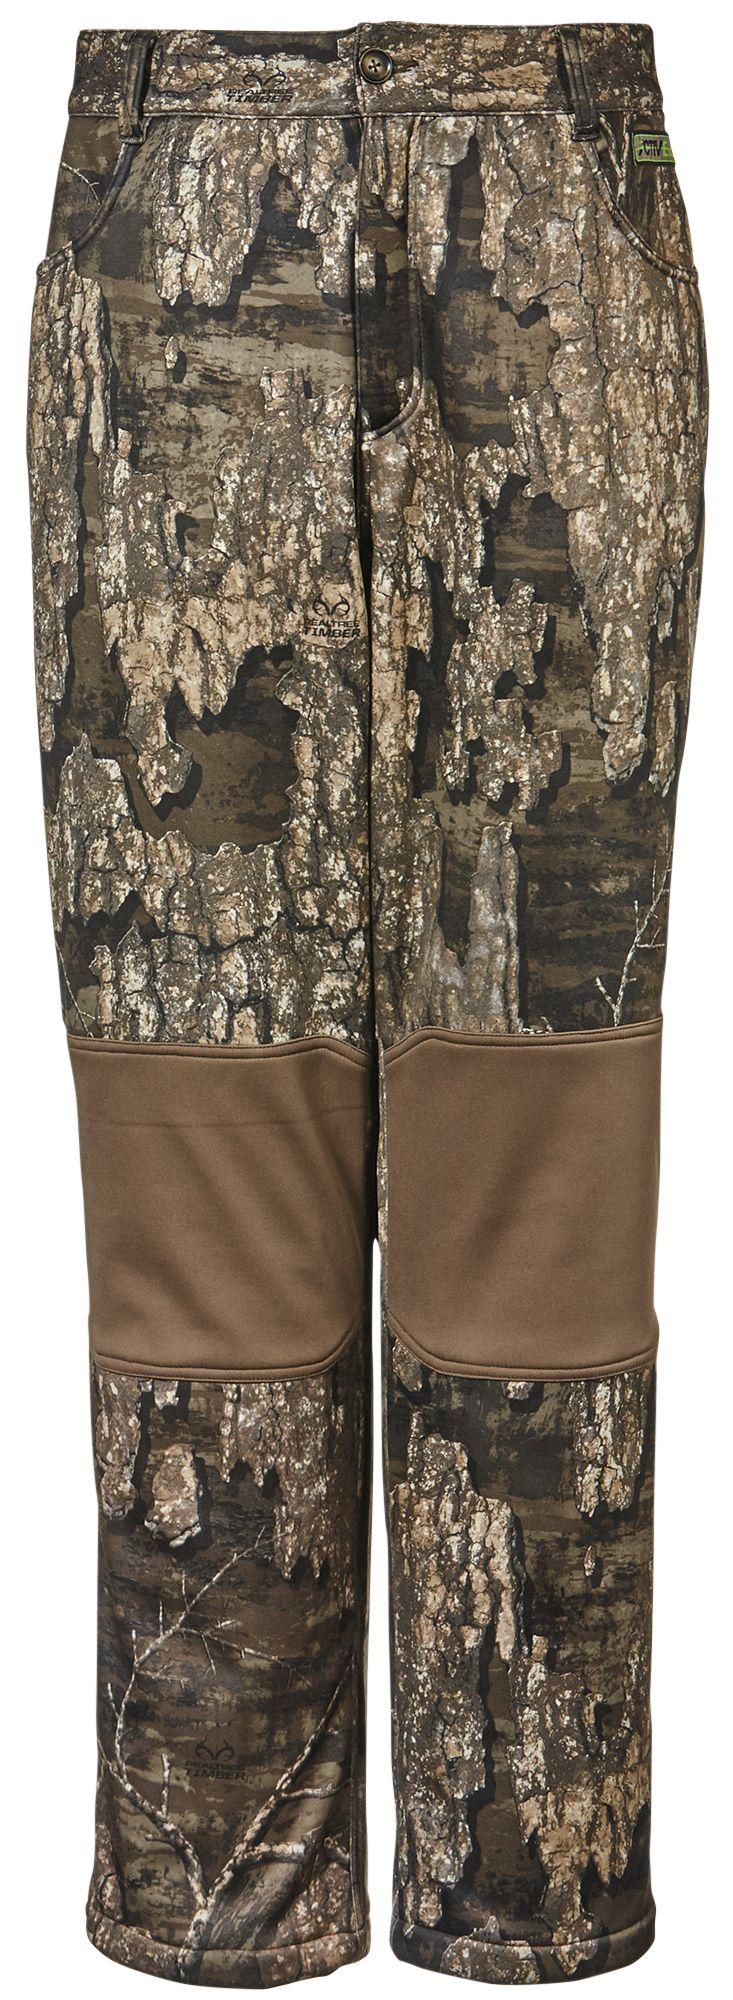 Drake Waterfowl Men's Non-Typical Endurance Hunting Pants, XL